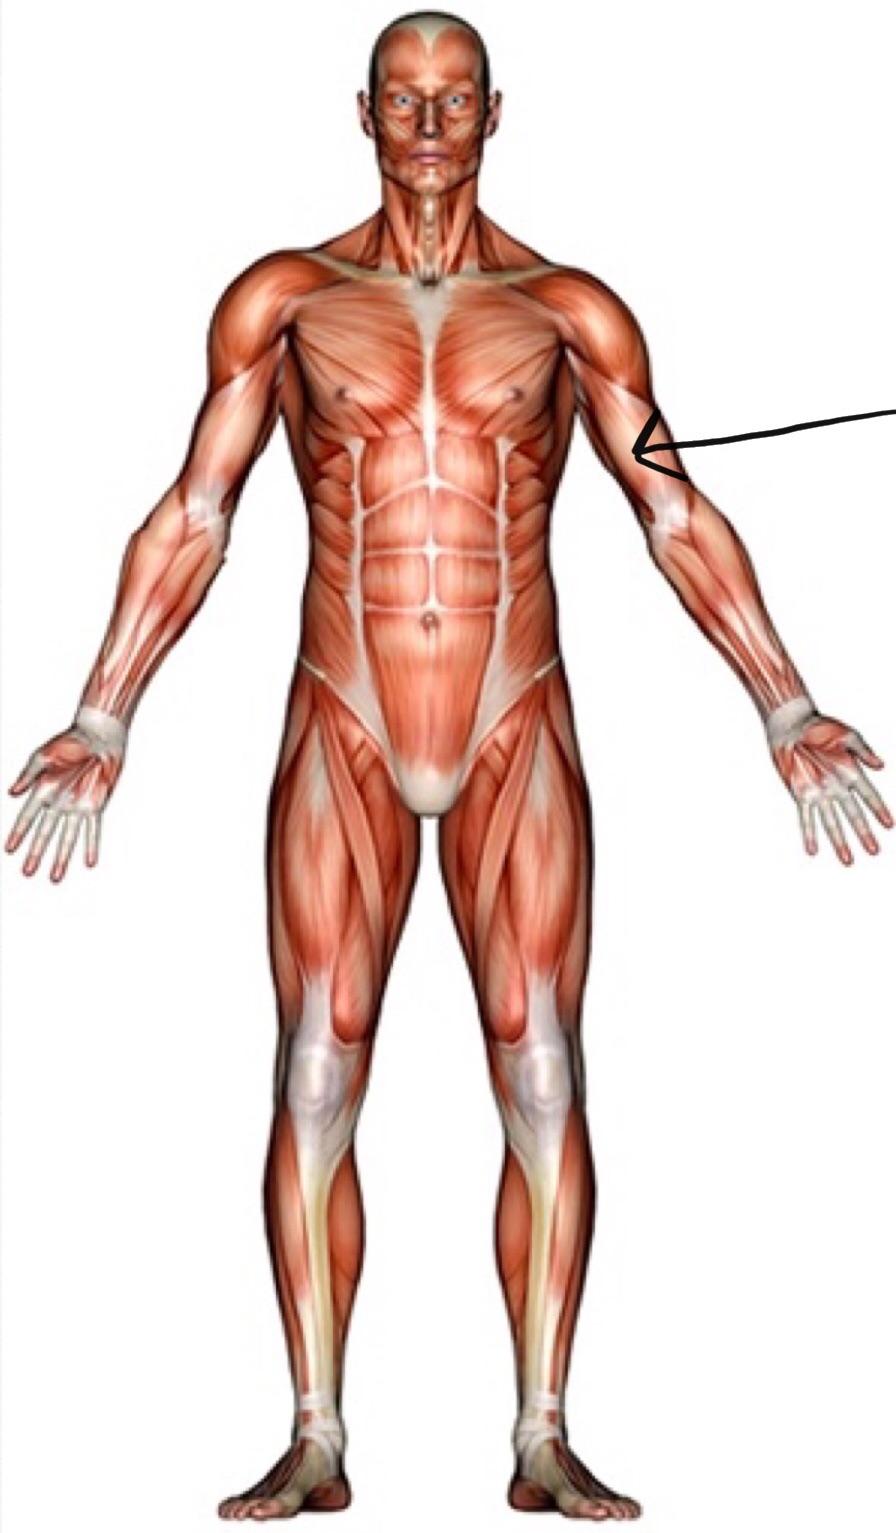 Level 2 Pe The Human Body Memrise